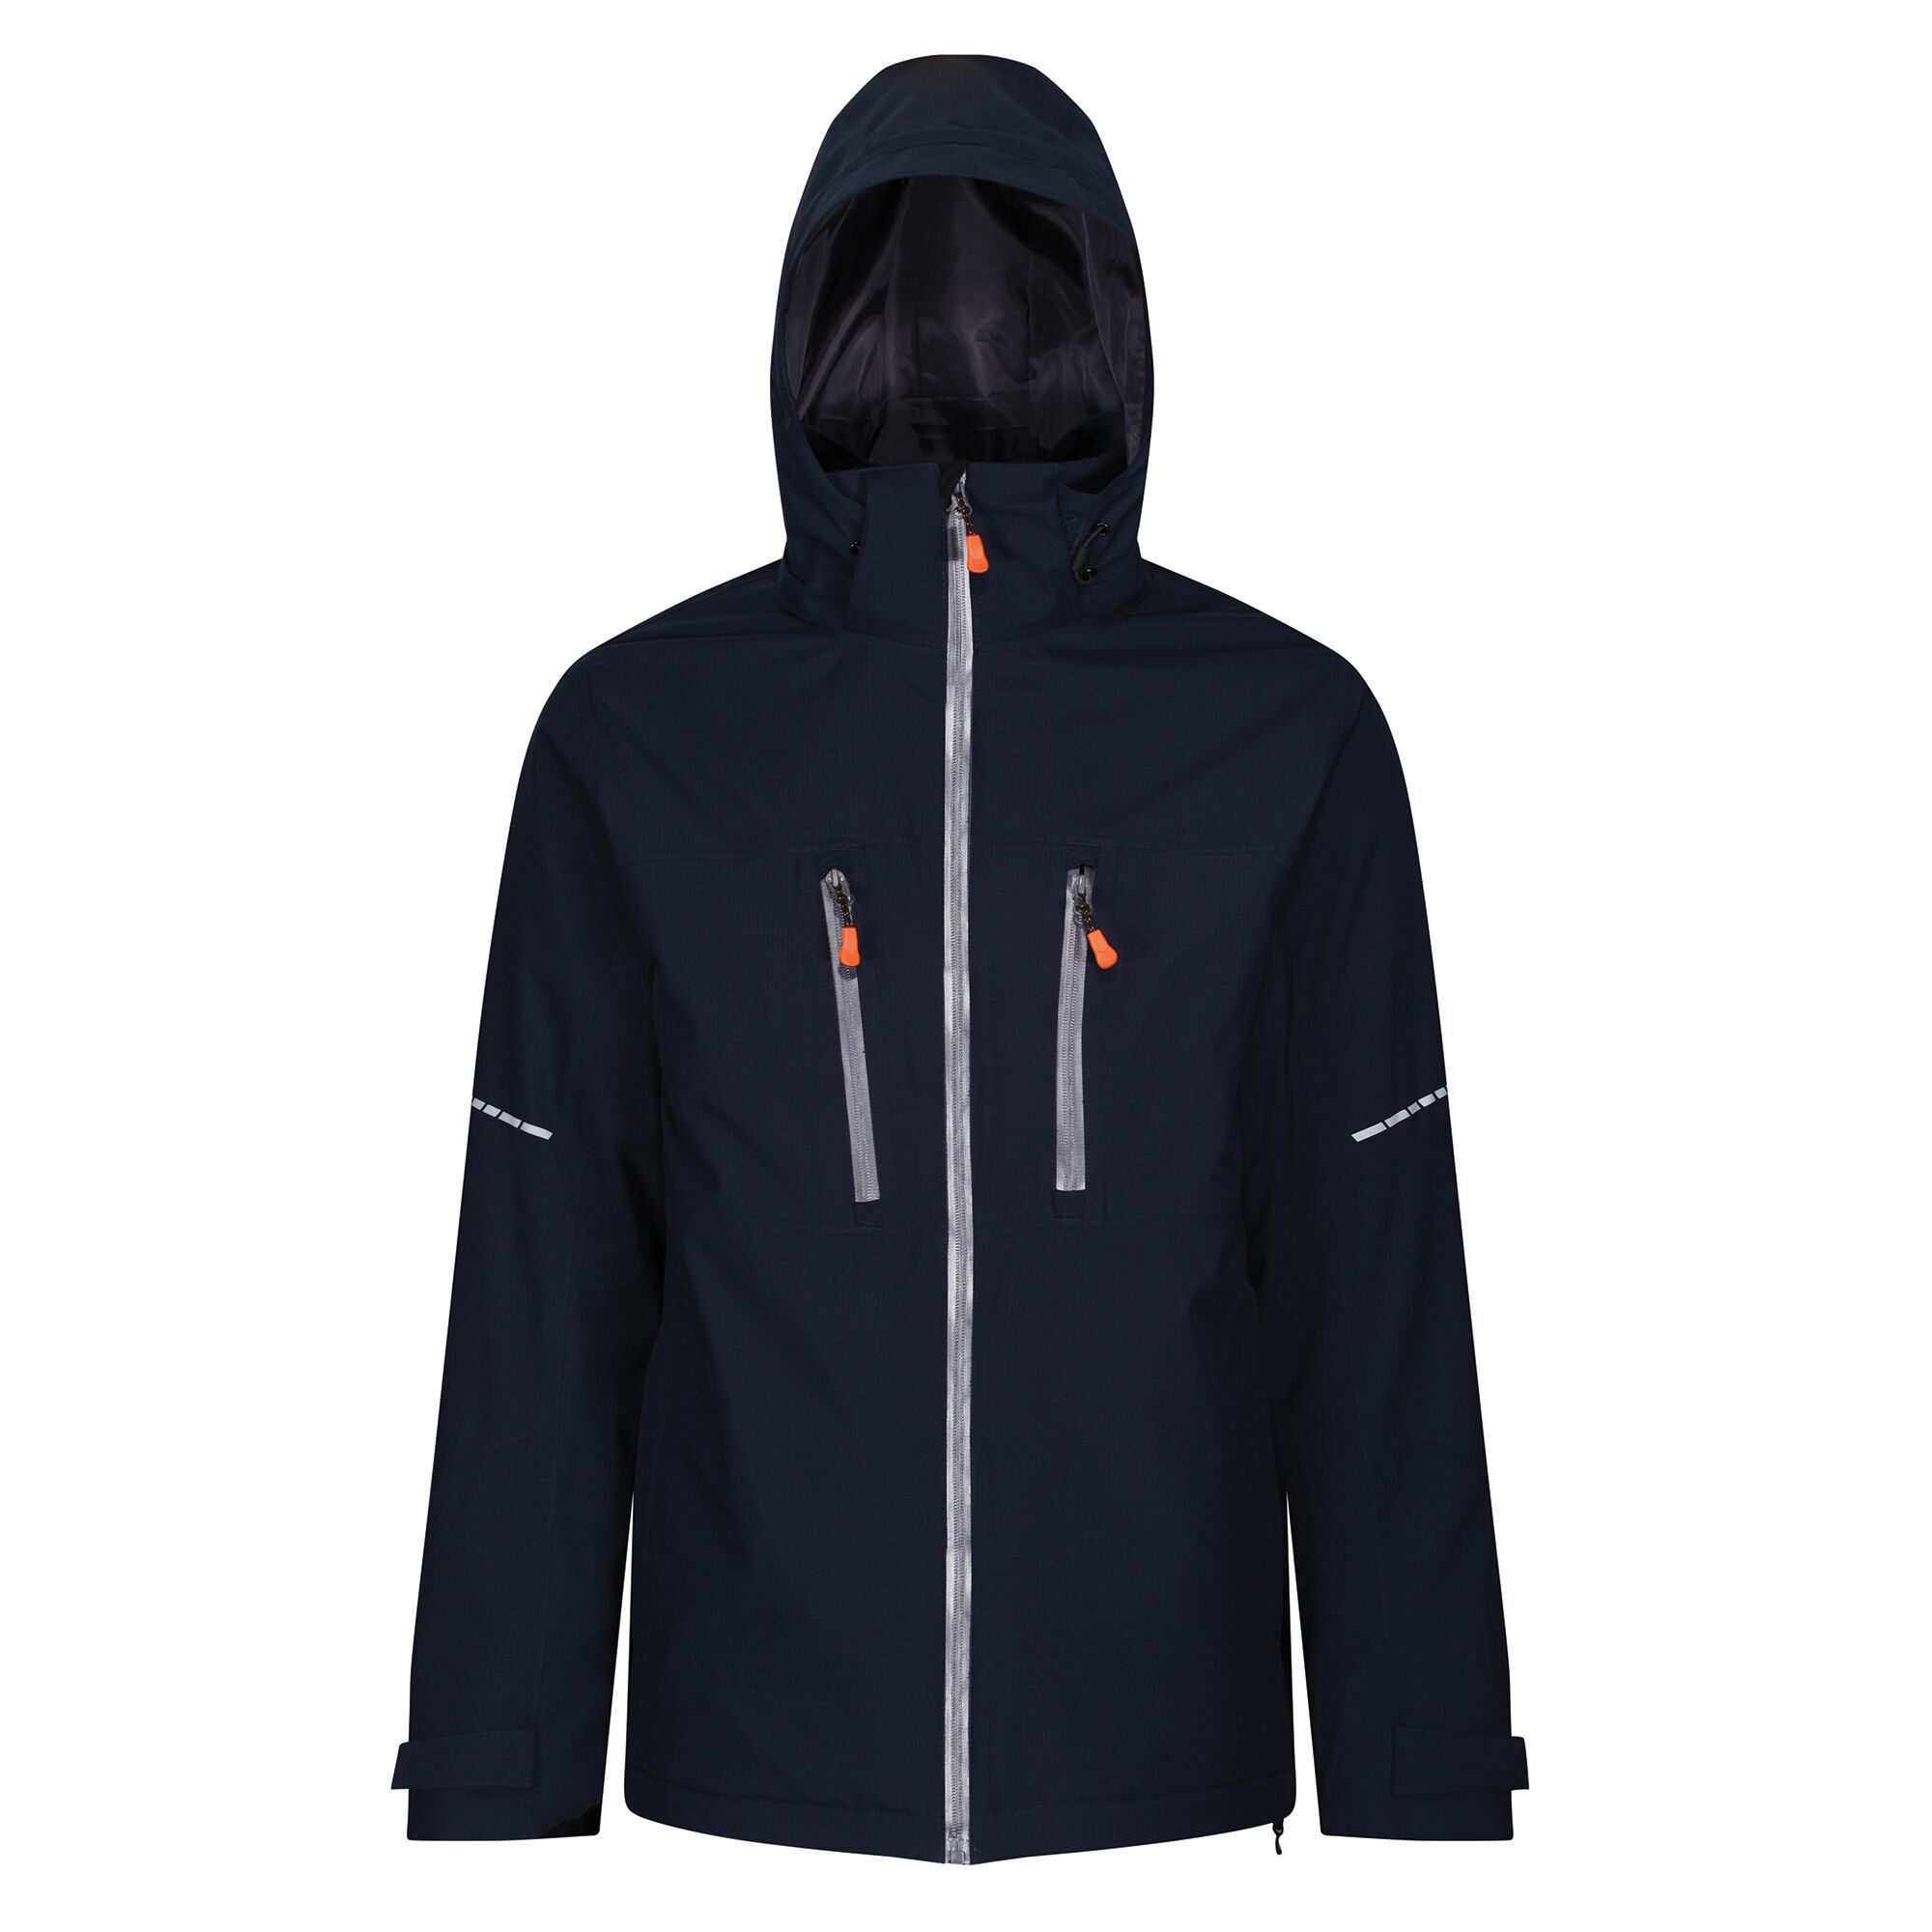 Regatta Mens X-Pro Marauder III Insulated Jacket (S) (Navy/Grey)